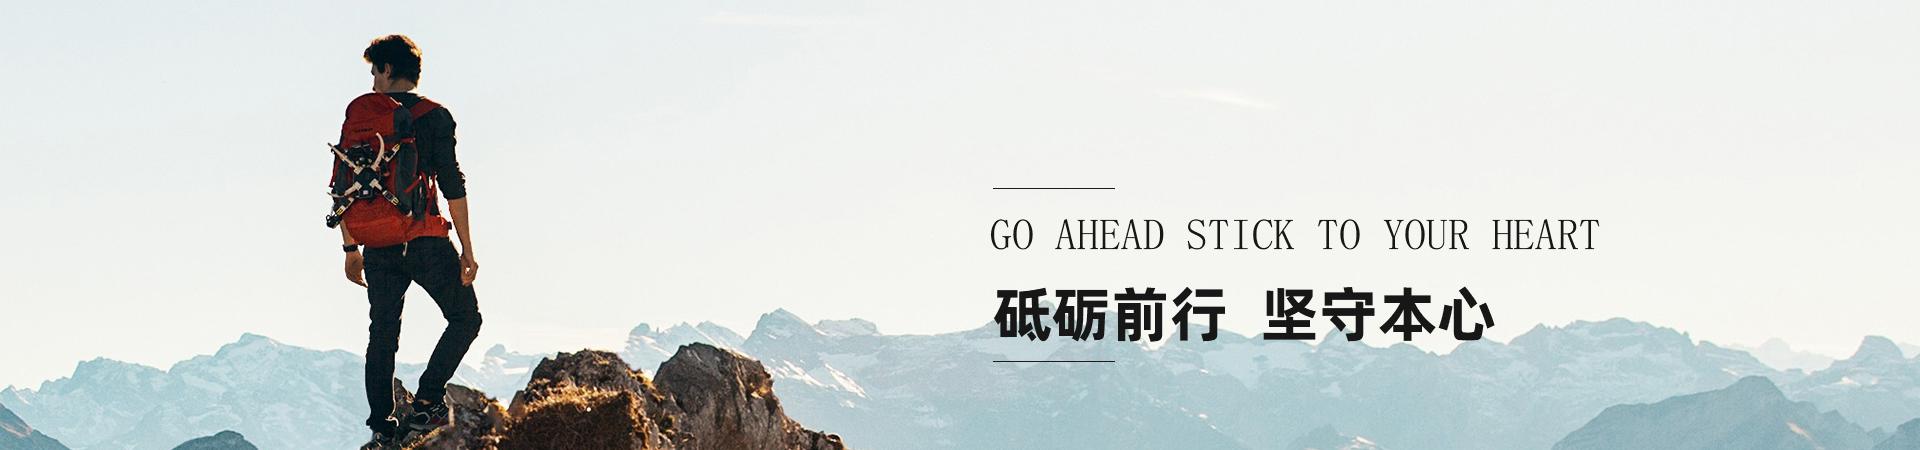 http://www.yixunda-sz.com/data/upload/202005/20200525152832_617.jpg